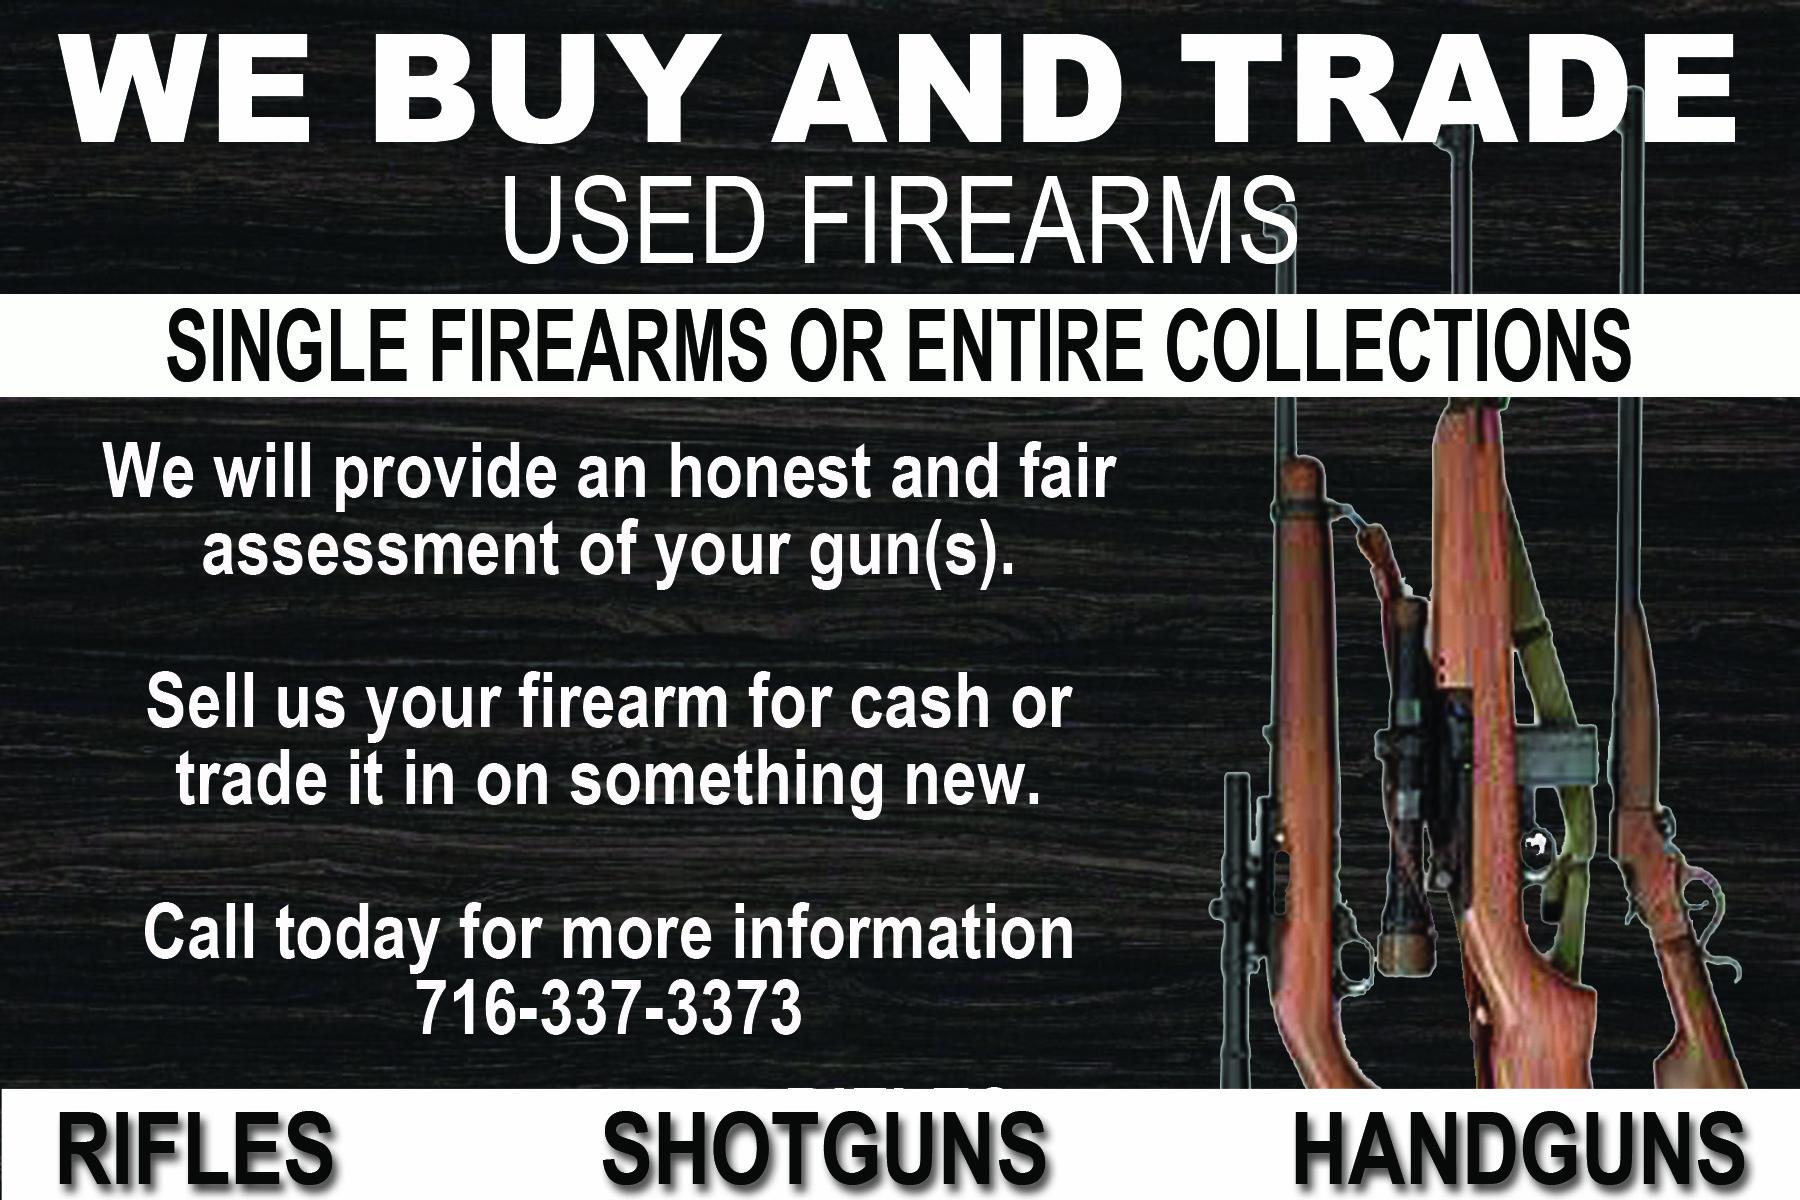 USED GUN IMAGE